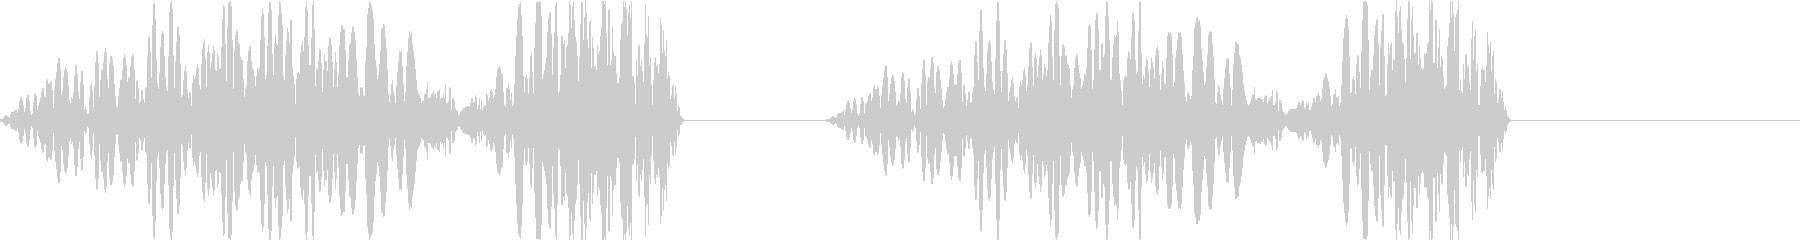 DJプレイ スクラッチ・ノイズ 250の未再生の波形